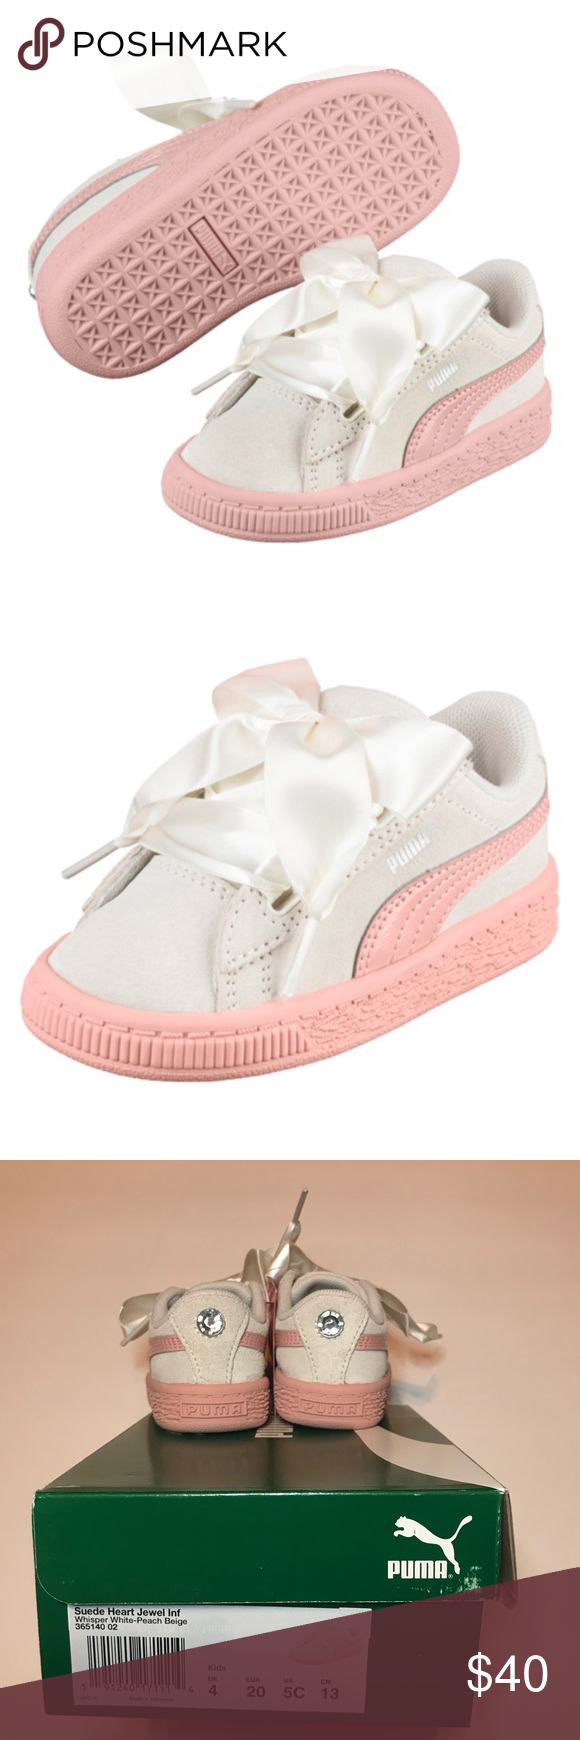 Puma Suede Heart Jewel Infant Sneakers Brand new inbox Puma